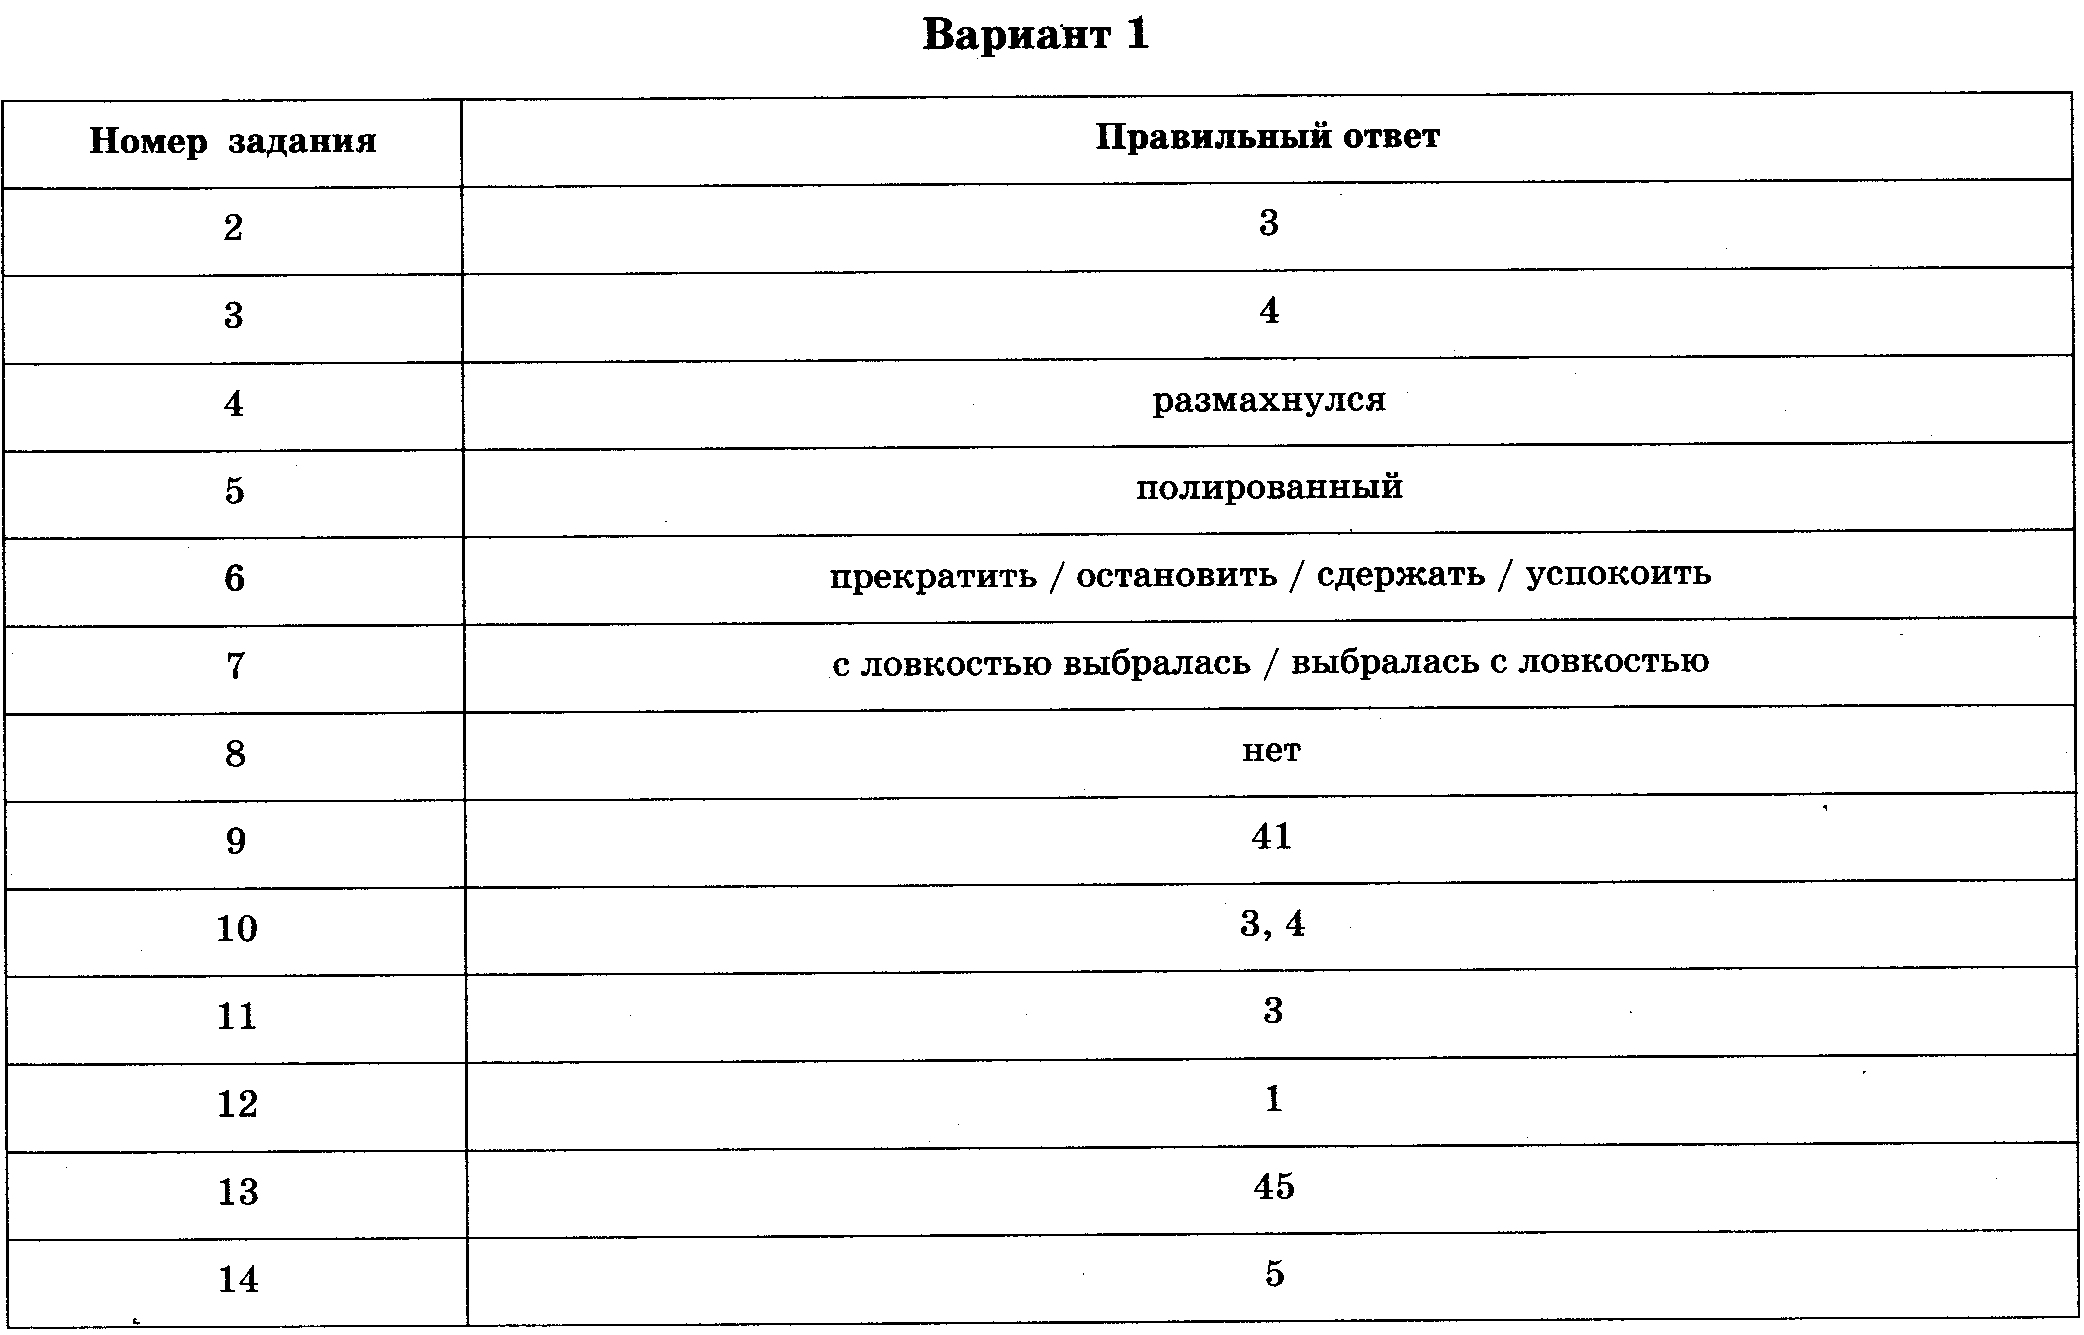 C:\Documents and Settings\Наташа\Рабочий стол\ОГЭ 2016\КИМы Степановой ОГЭ-2016\img299.jpg